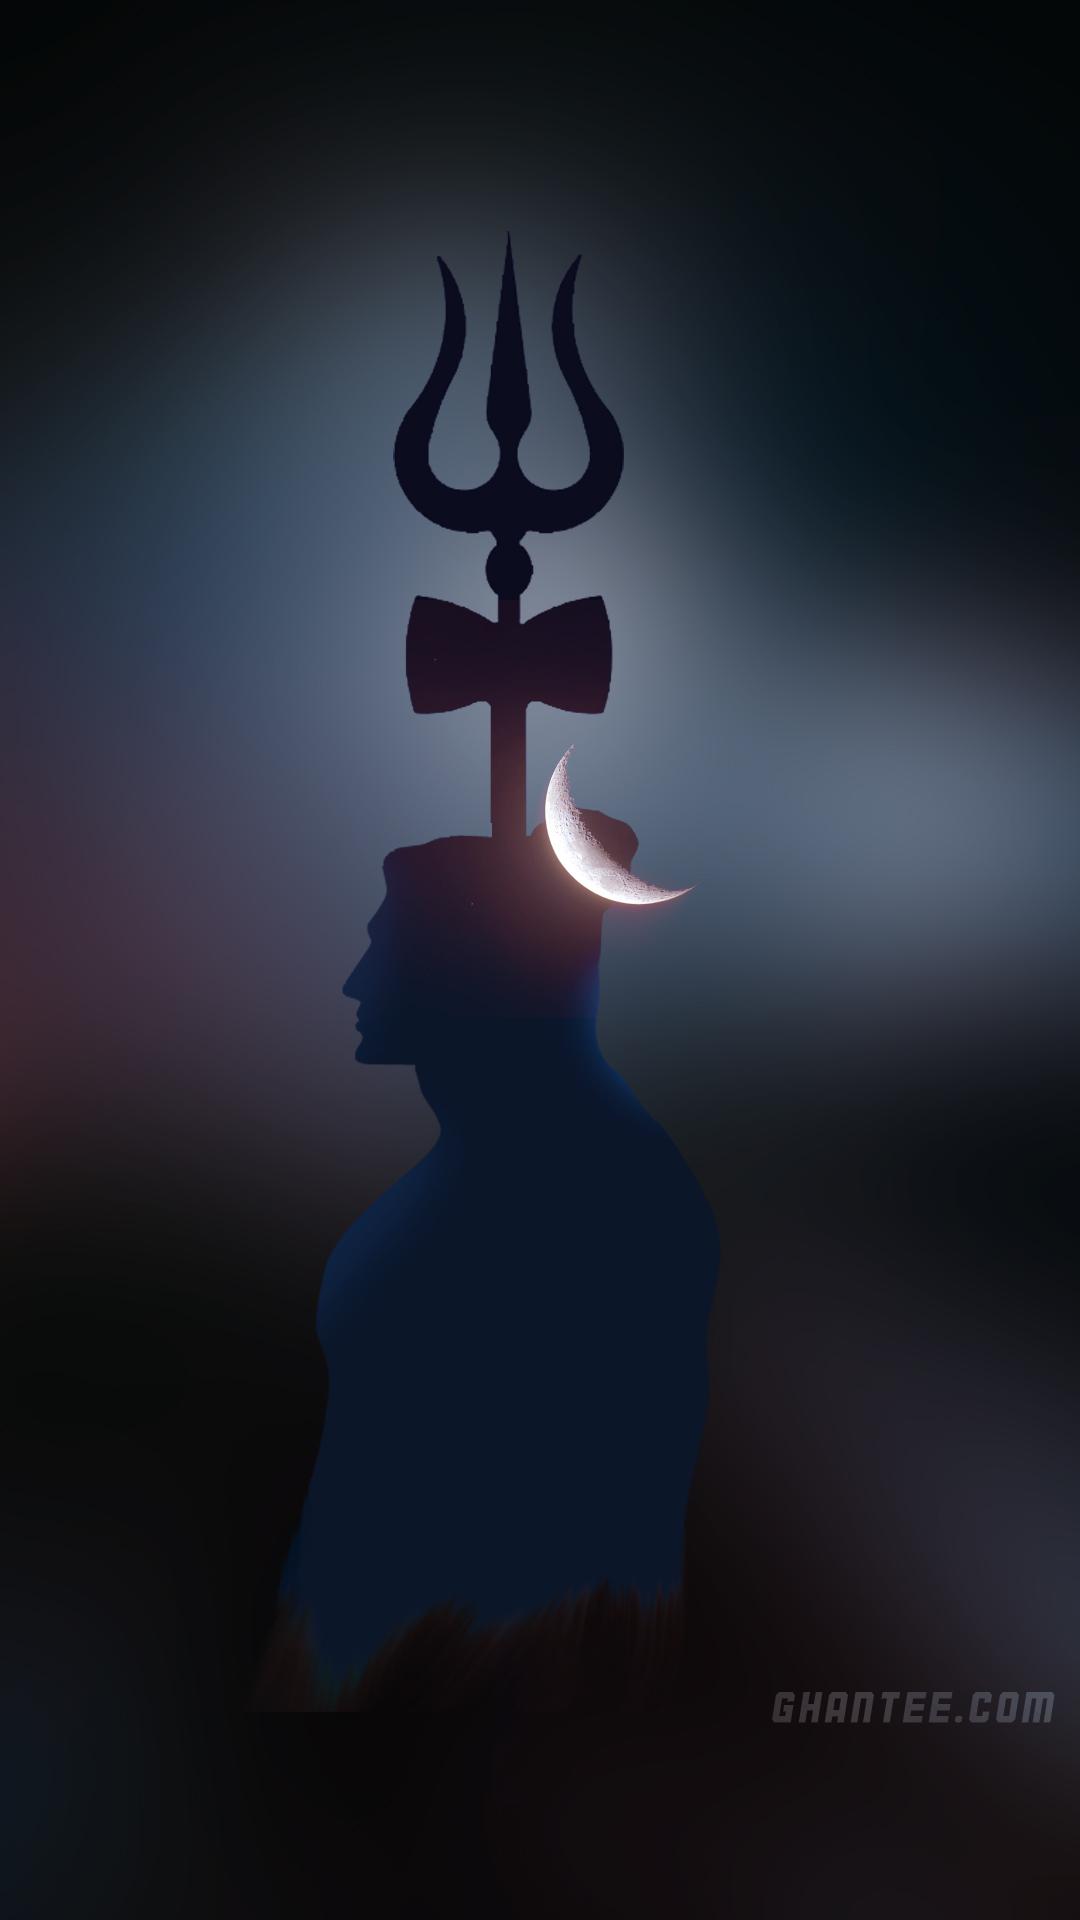 lord shiva moon night hd phone wallpaper